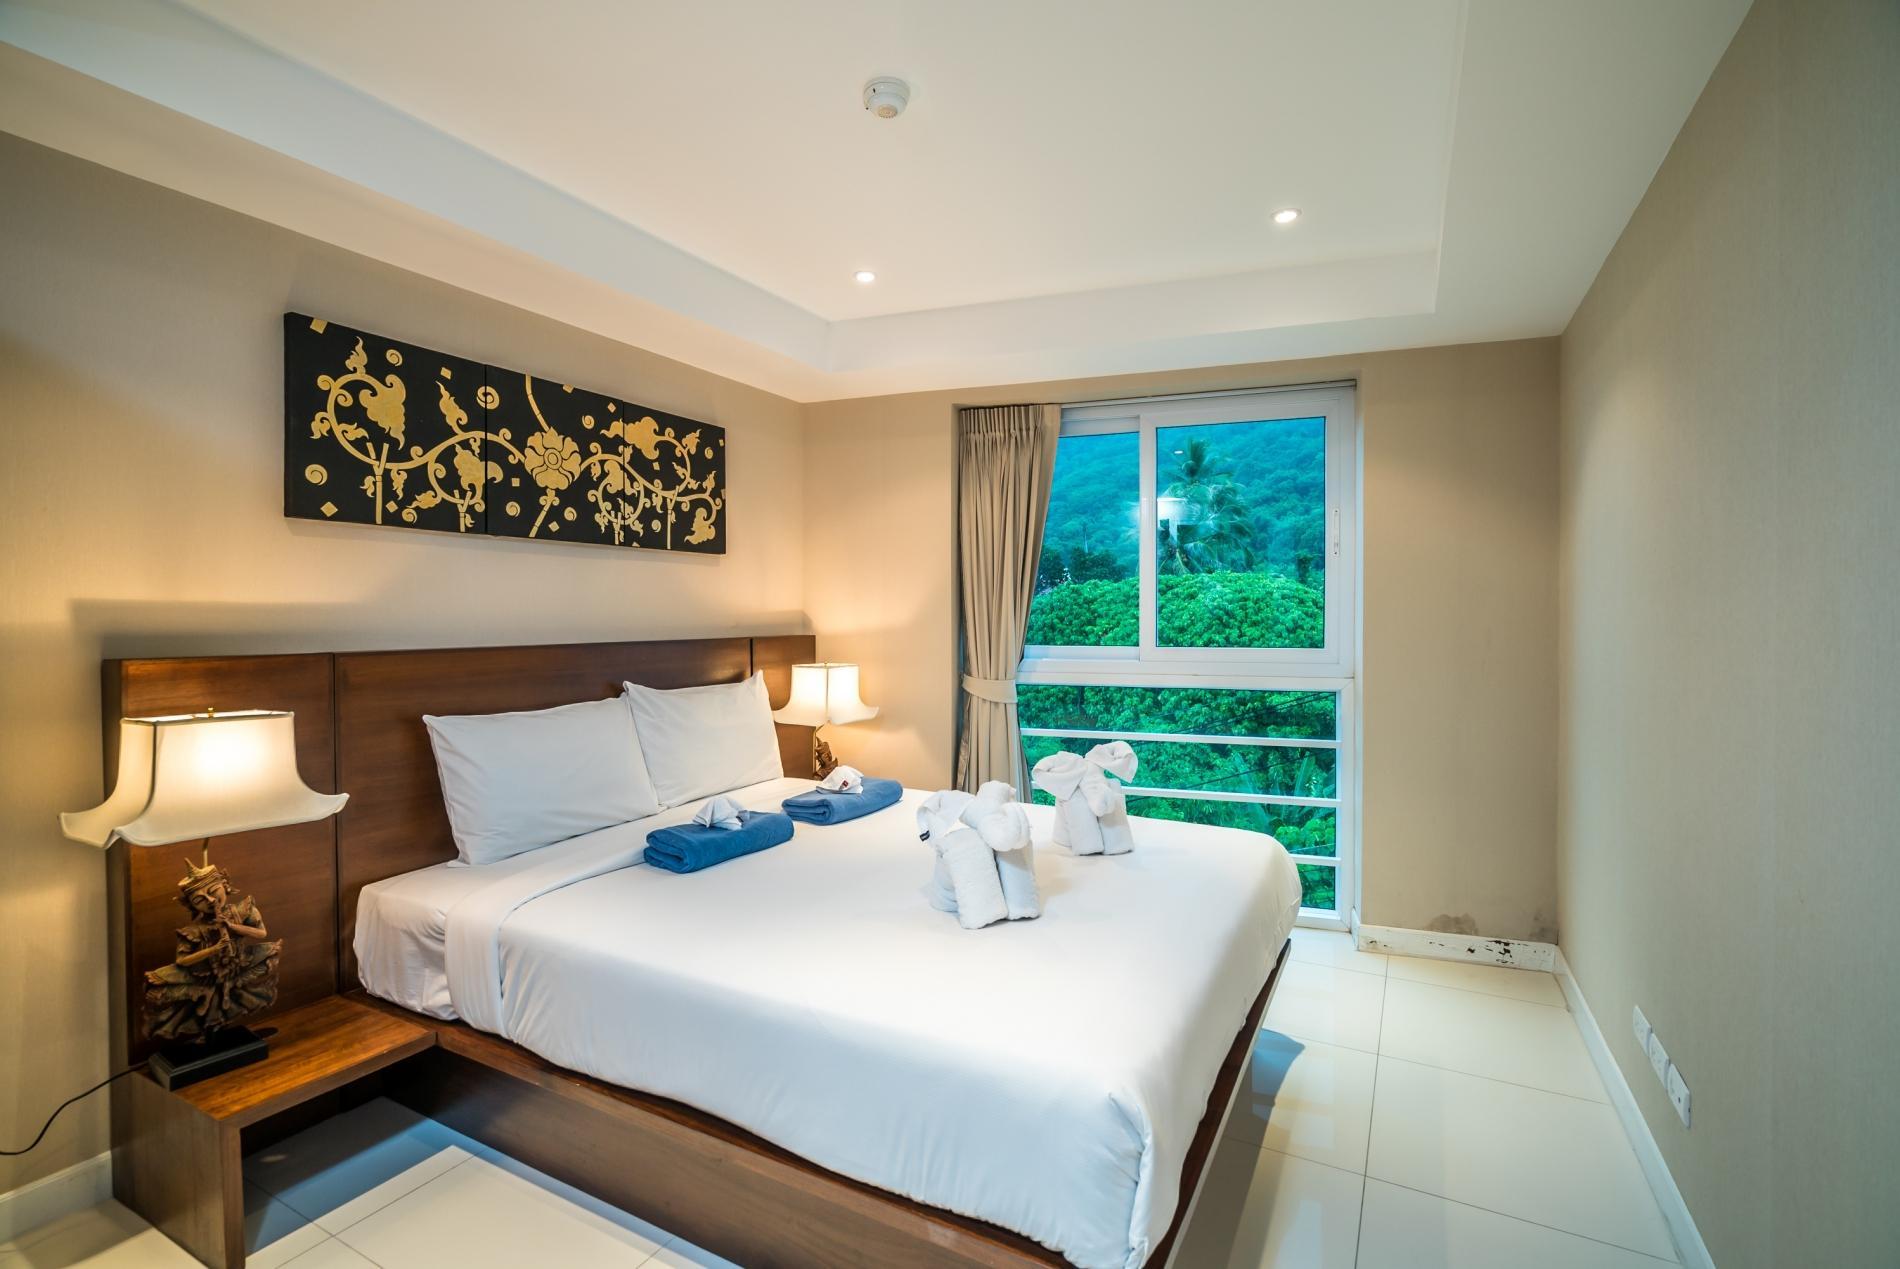 Kata Ocean View condominium - 1 bdr mountain view apartment photo 20390556